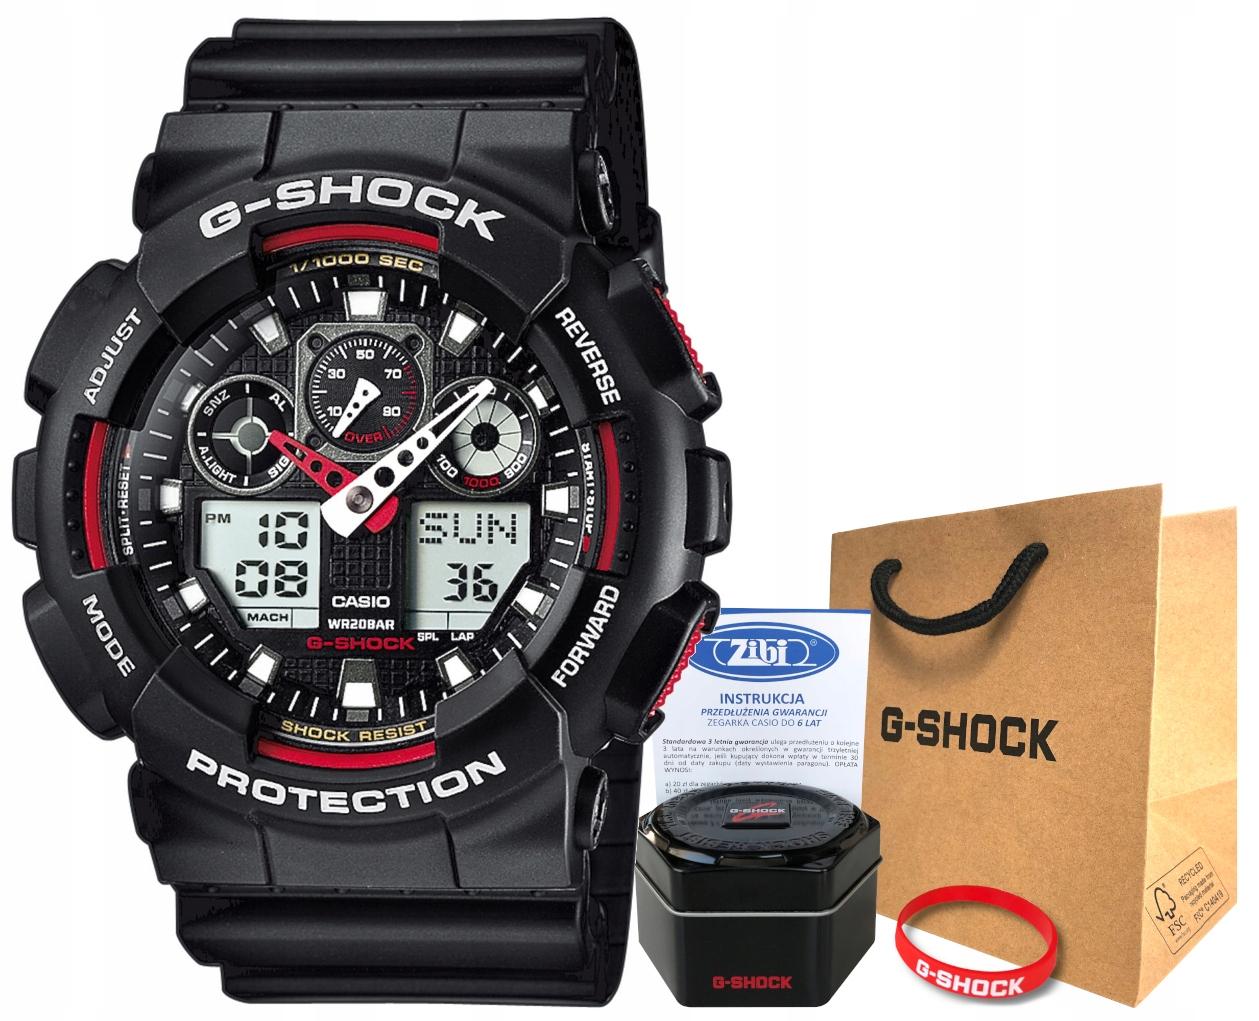 Zegarek Casio G-SHOCK GA-100-1A4ER 20BAR hologram